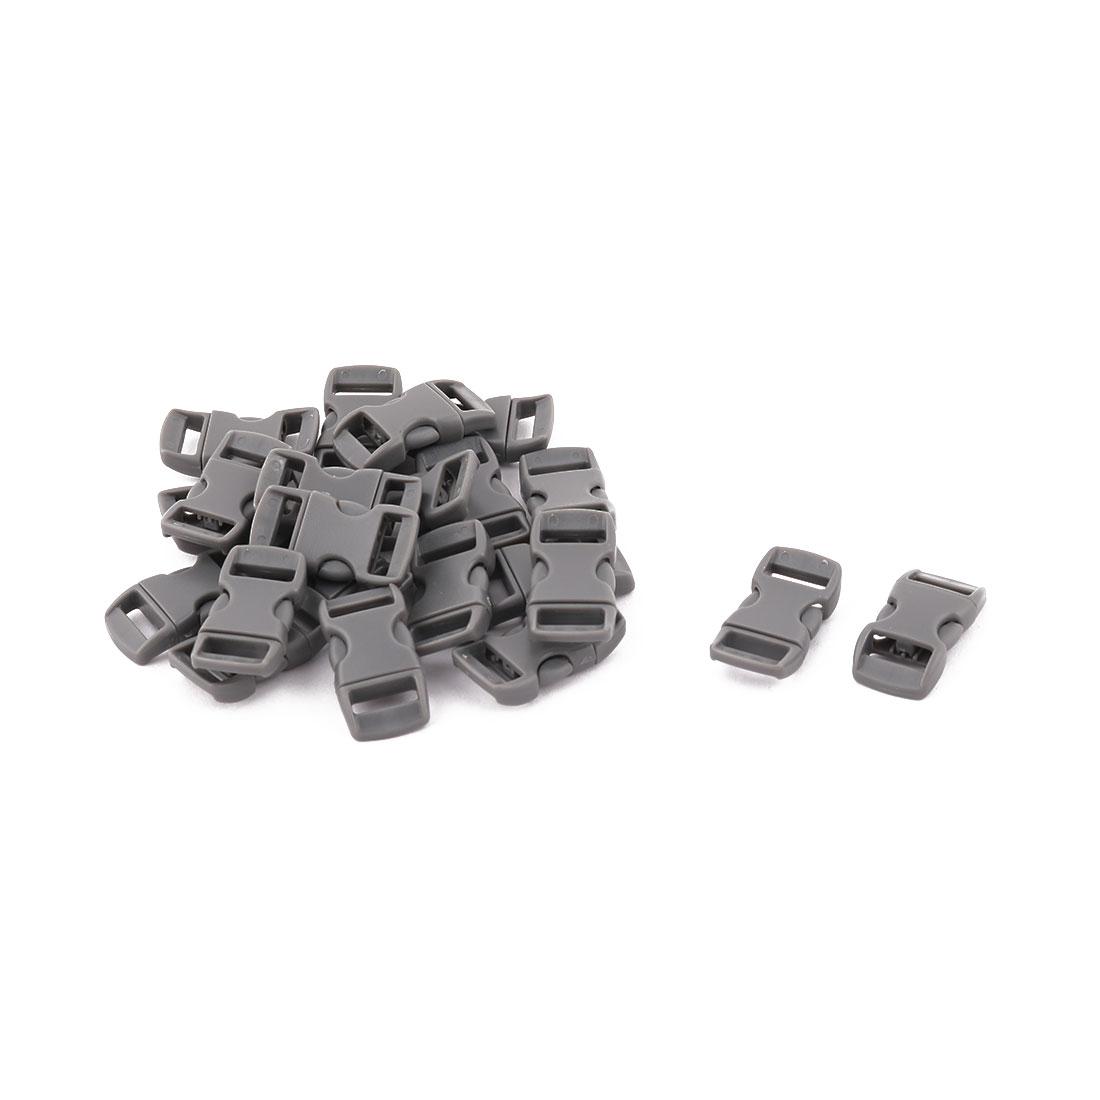 Bag Plastic Strap Webbing Belt Adjustive Connecting Quick Release Buckle Dark Gray 20 Pcs